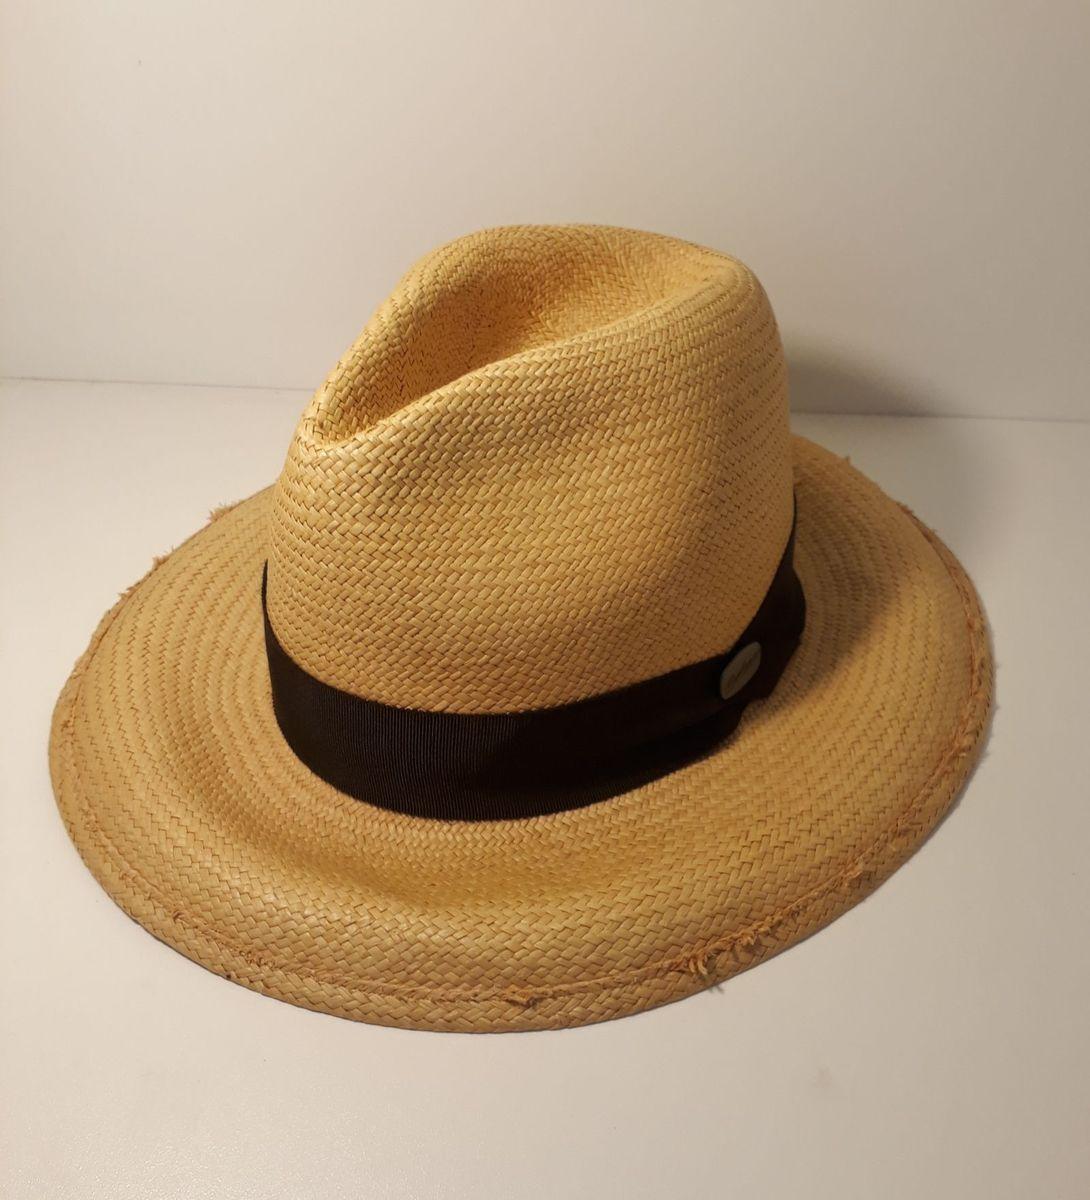 2b964160de491 chapéu panamá - chapeu sem-marca.  Czm6ly9wag90b3muzw5qb2vplmnvbs5ici9wcm9kdwn0cy85mzgxndu5l2q2ytc2njaznzczzdy0ogu2n2zhmtyxntvkmgu3n2nmlmpwzw  ...